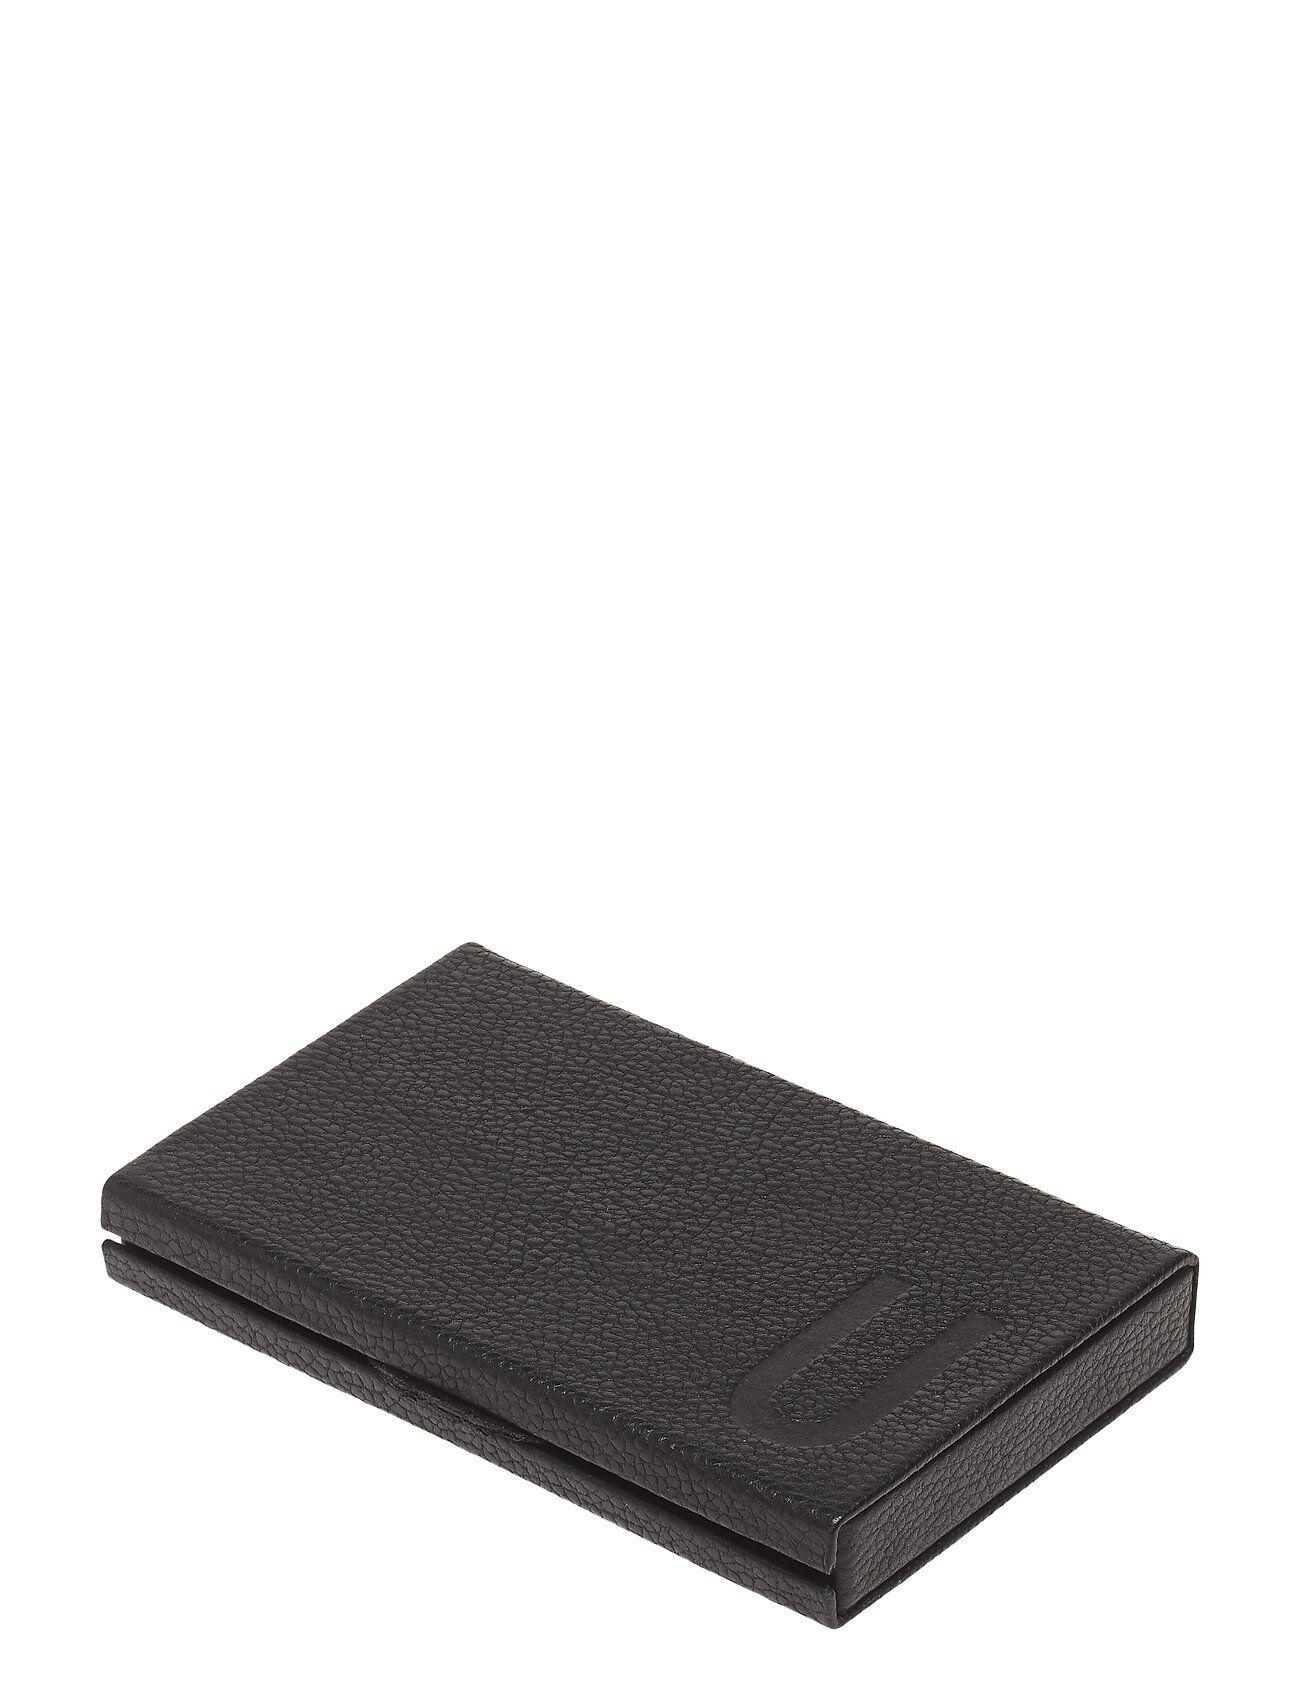 Design Letters Personal Card Holder Kodin Sisustus Harmaa Design Letters